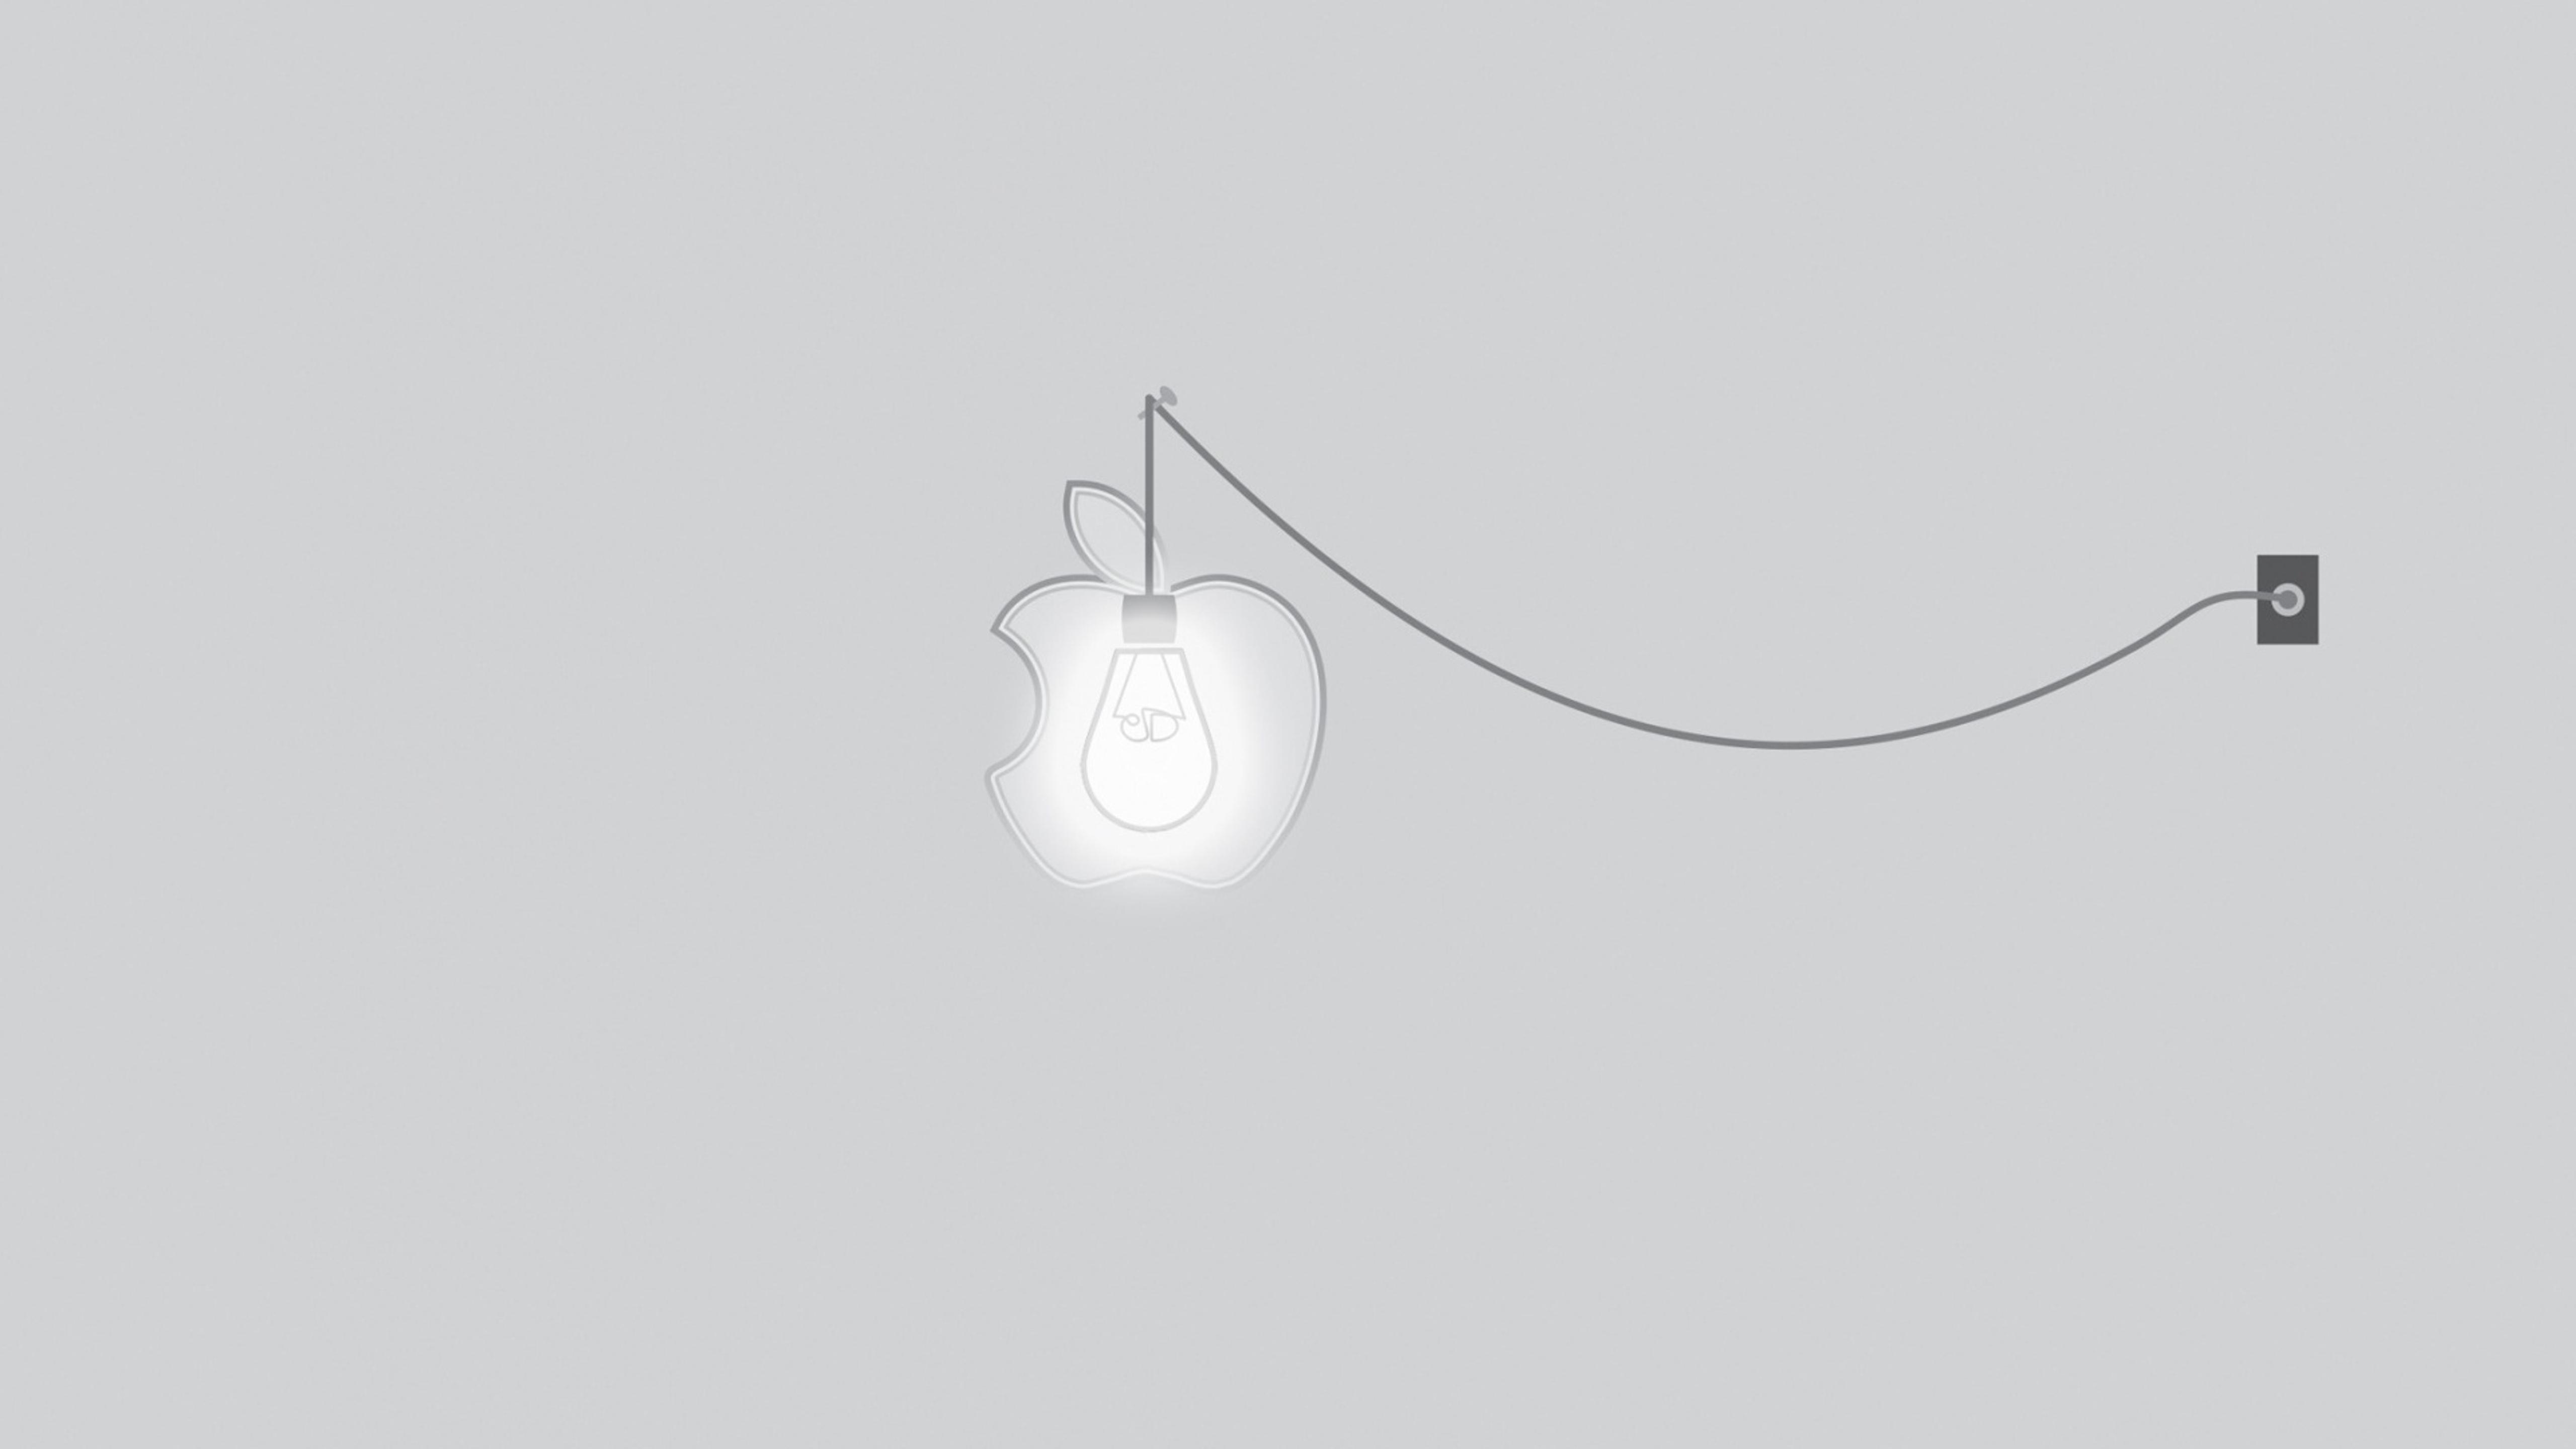 apple lightning - funny apple wallpaper wallpaper download 5120x2880